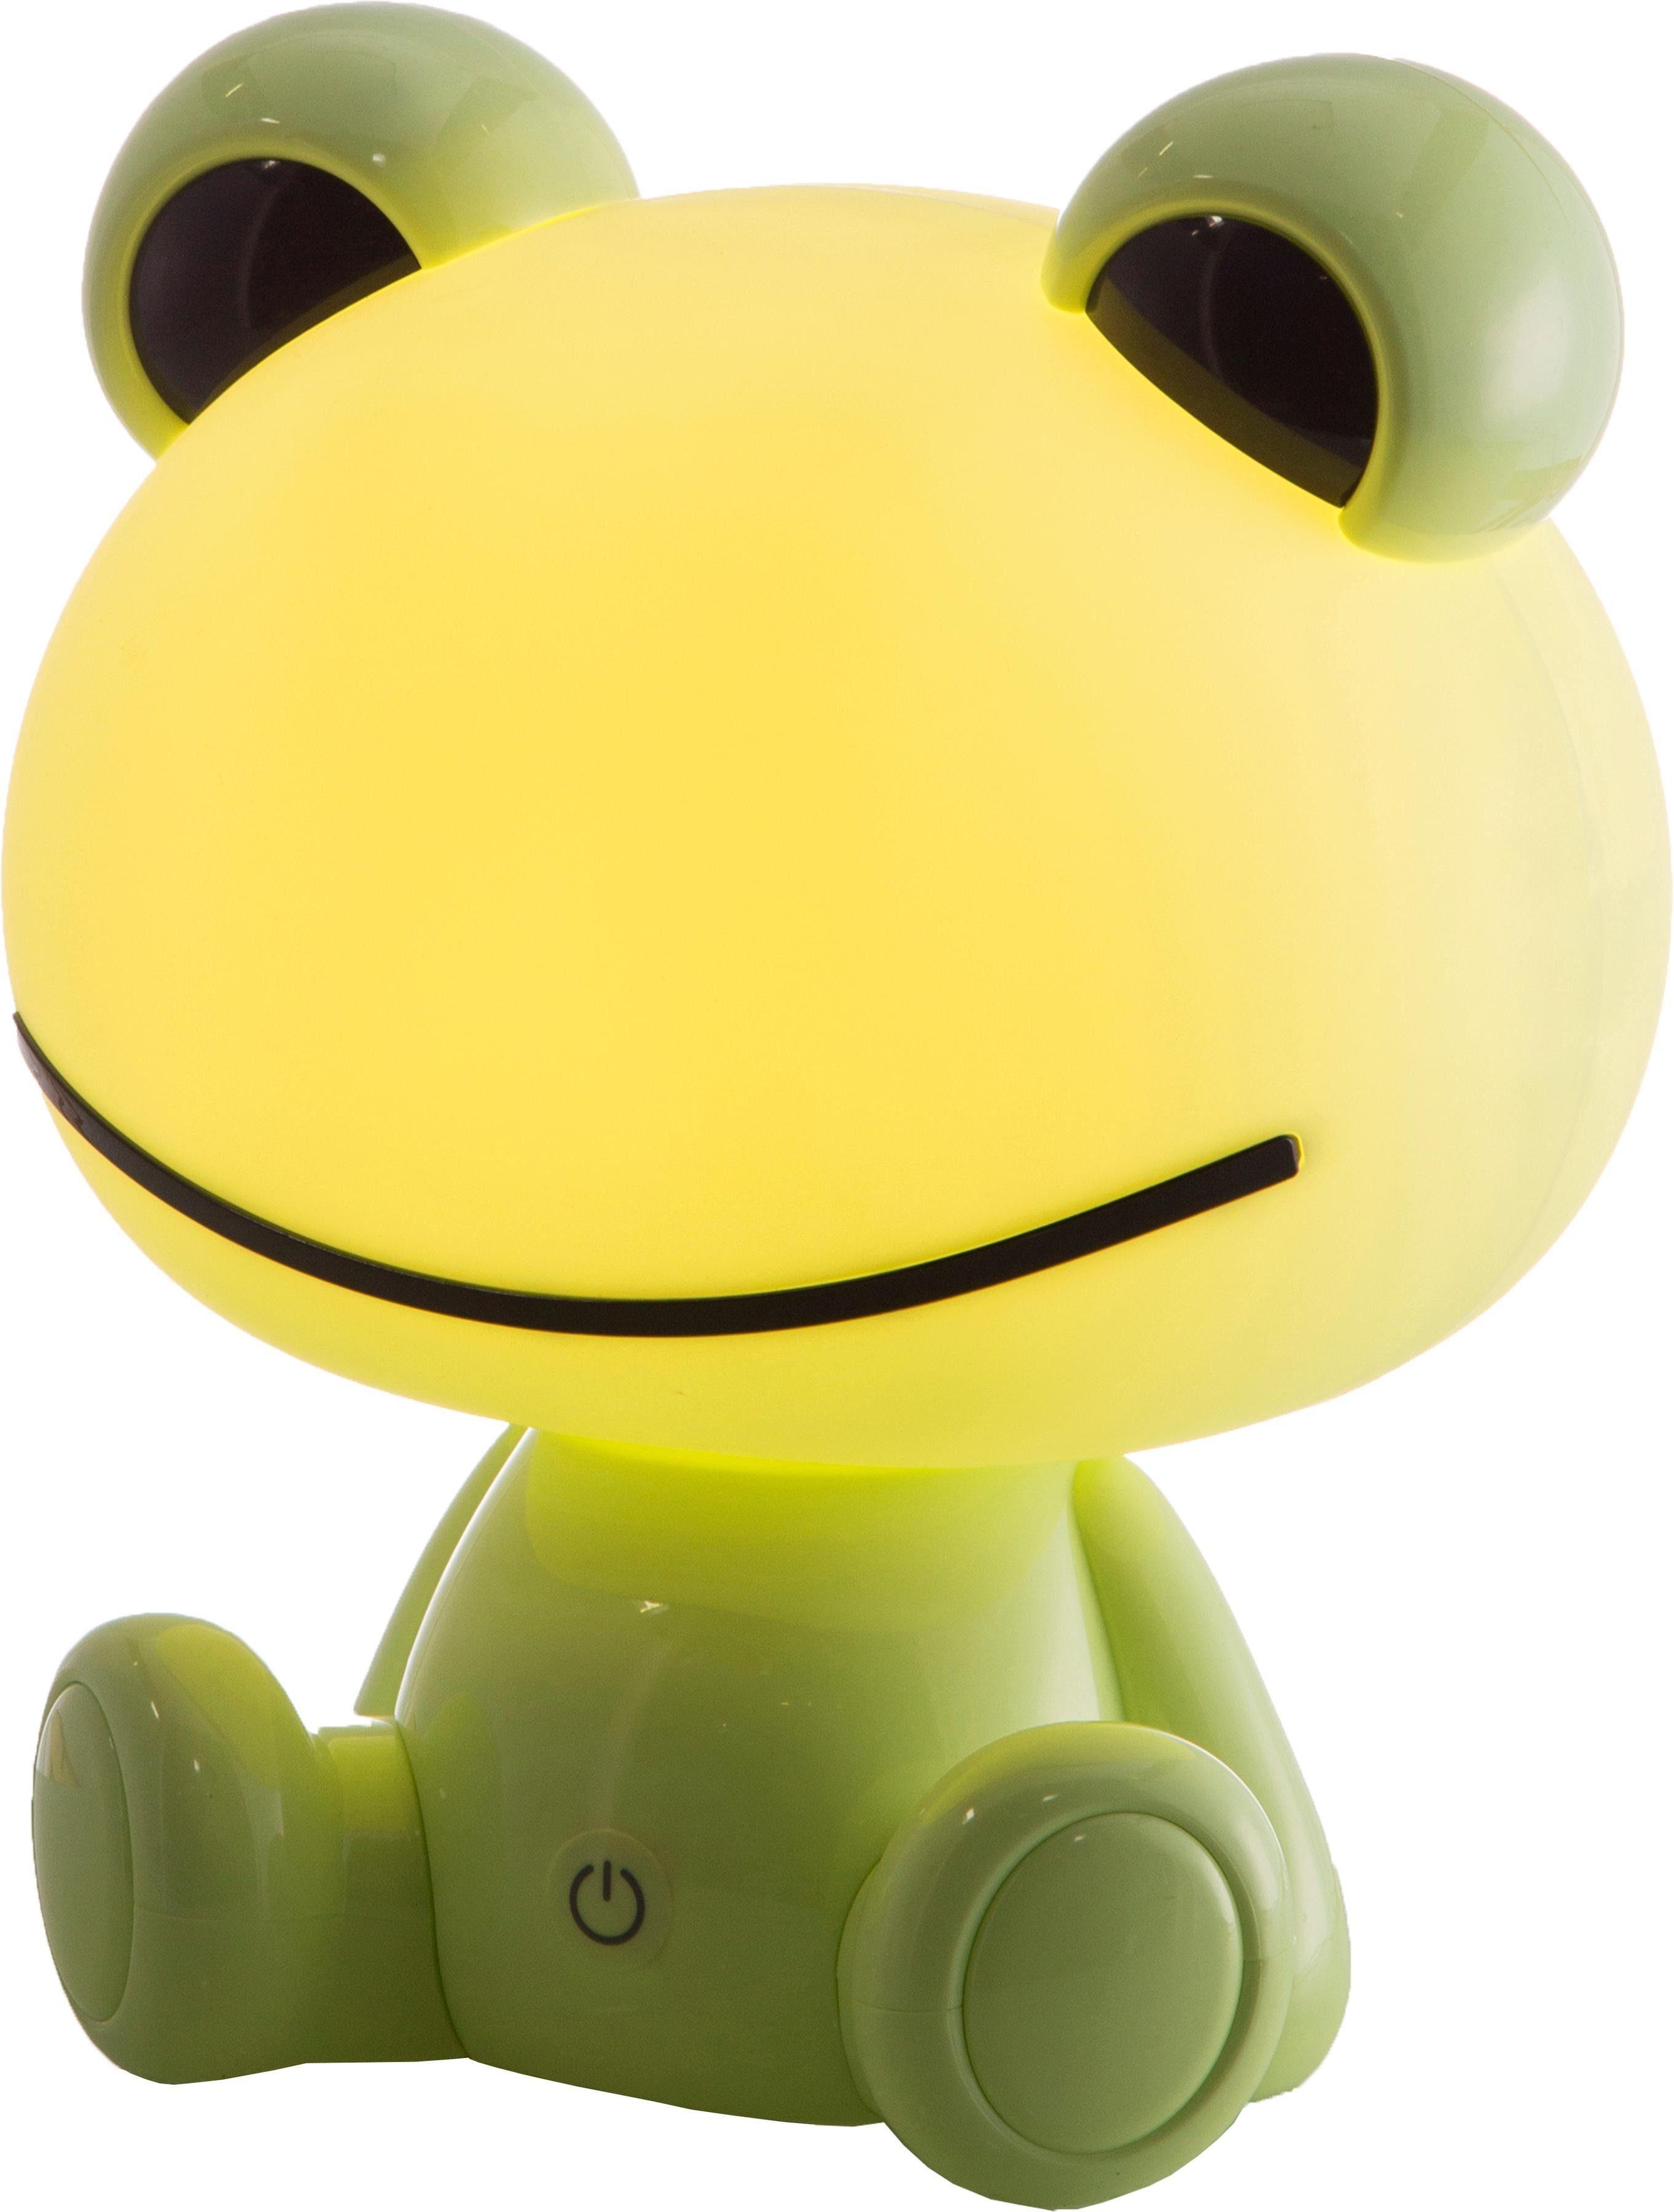 Nino Leuchten,LED Tischleuchte Frog